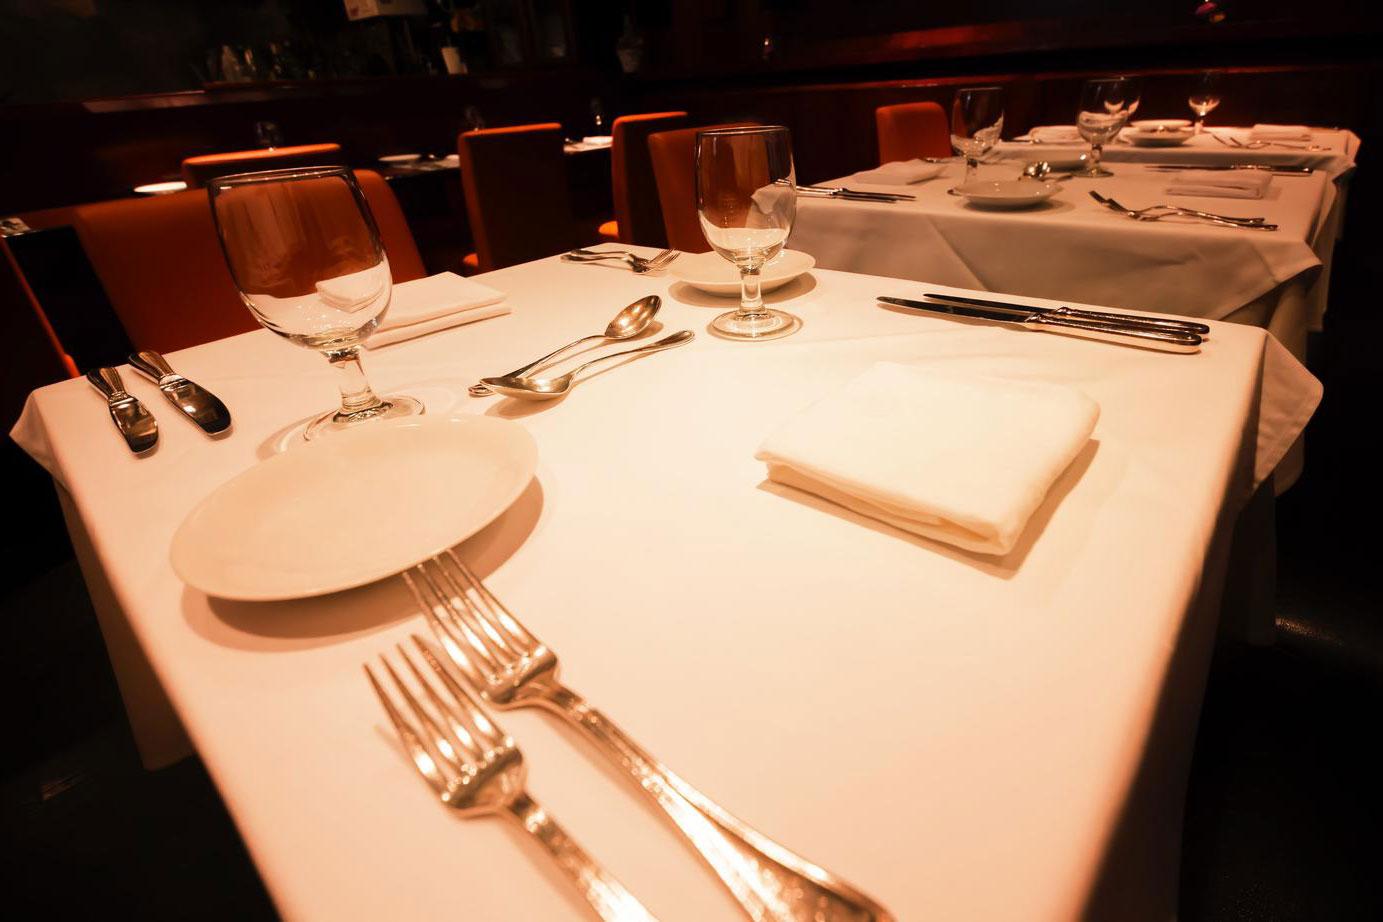 https://www.ip-lambda.com/images/chamveil/restaurant2_02.jpg